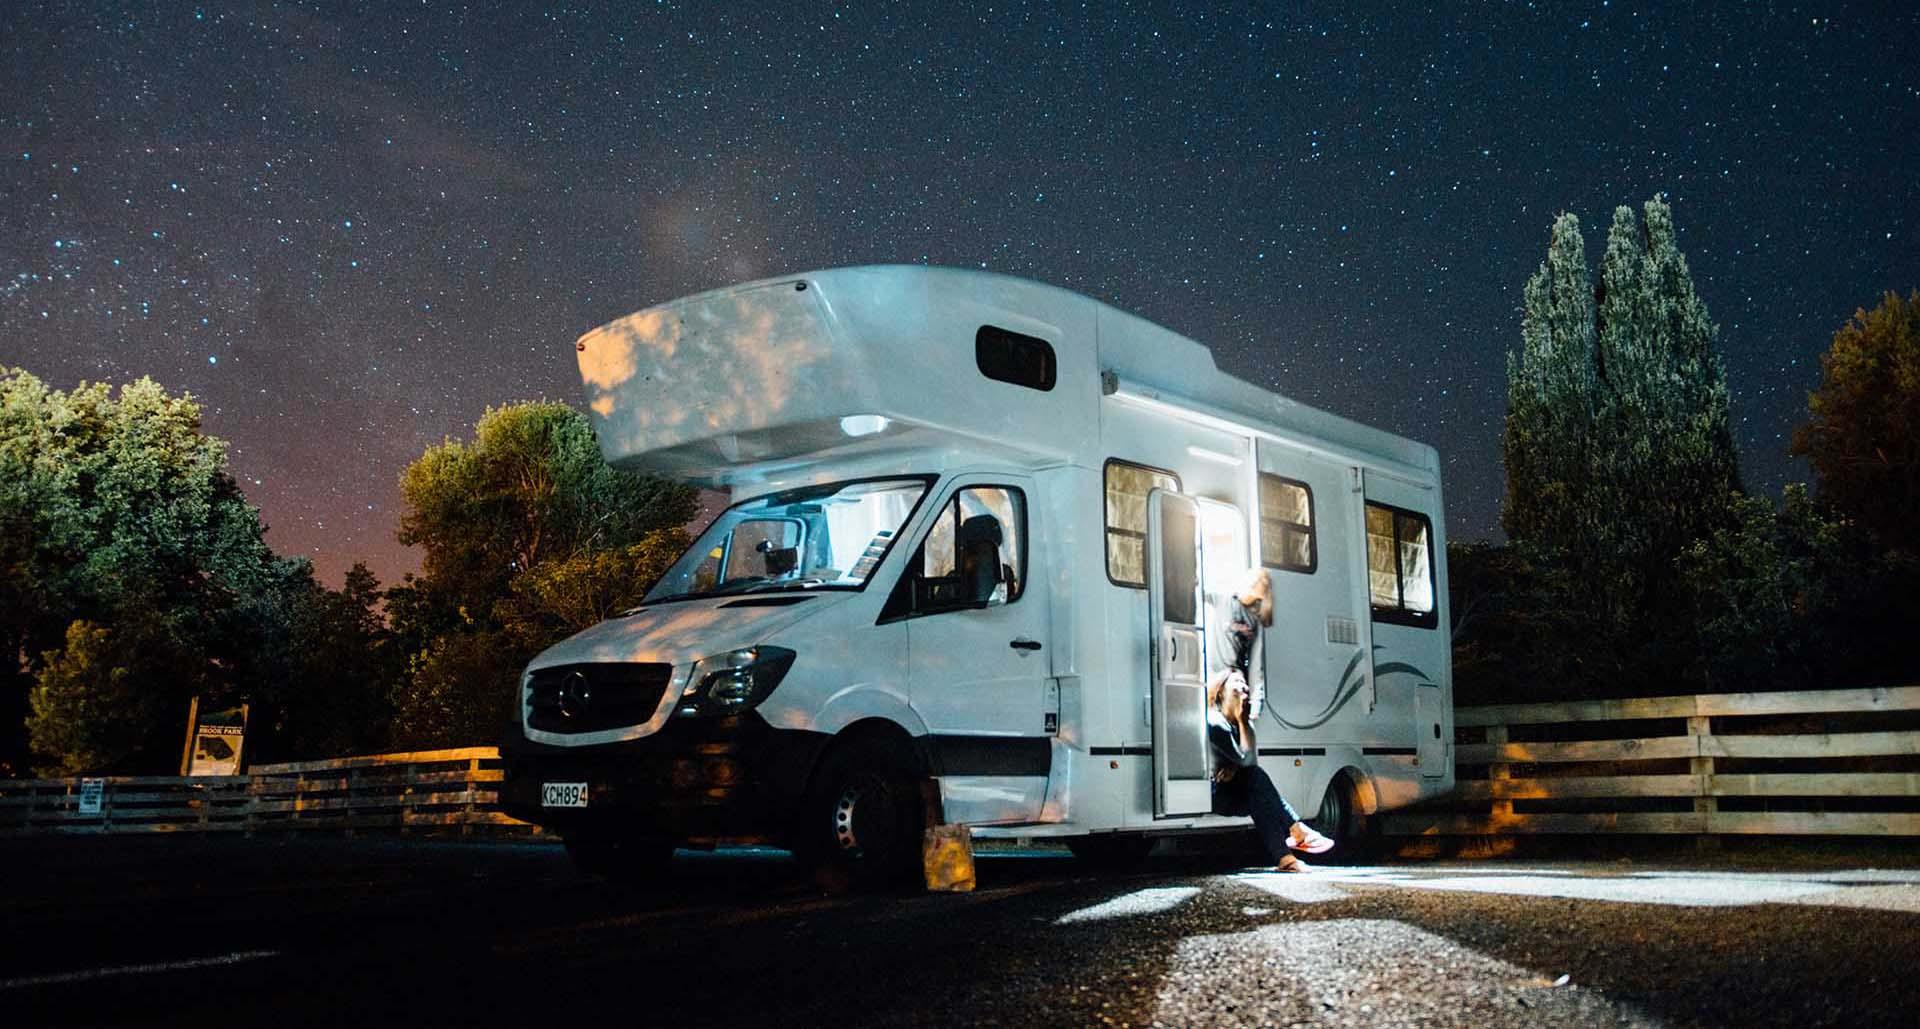 White motorhome parked at night